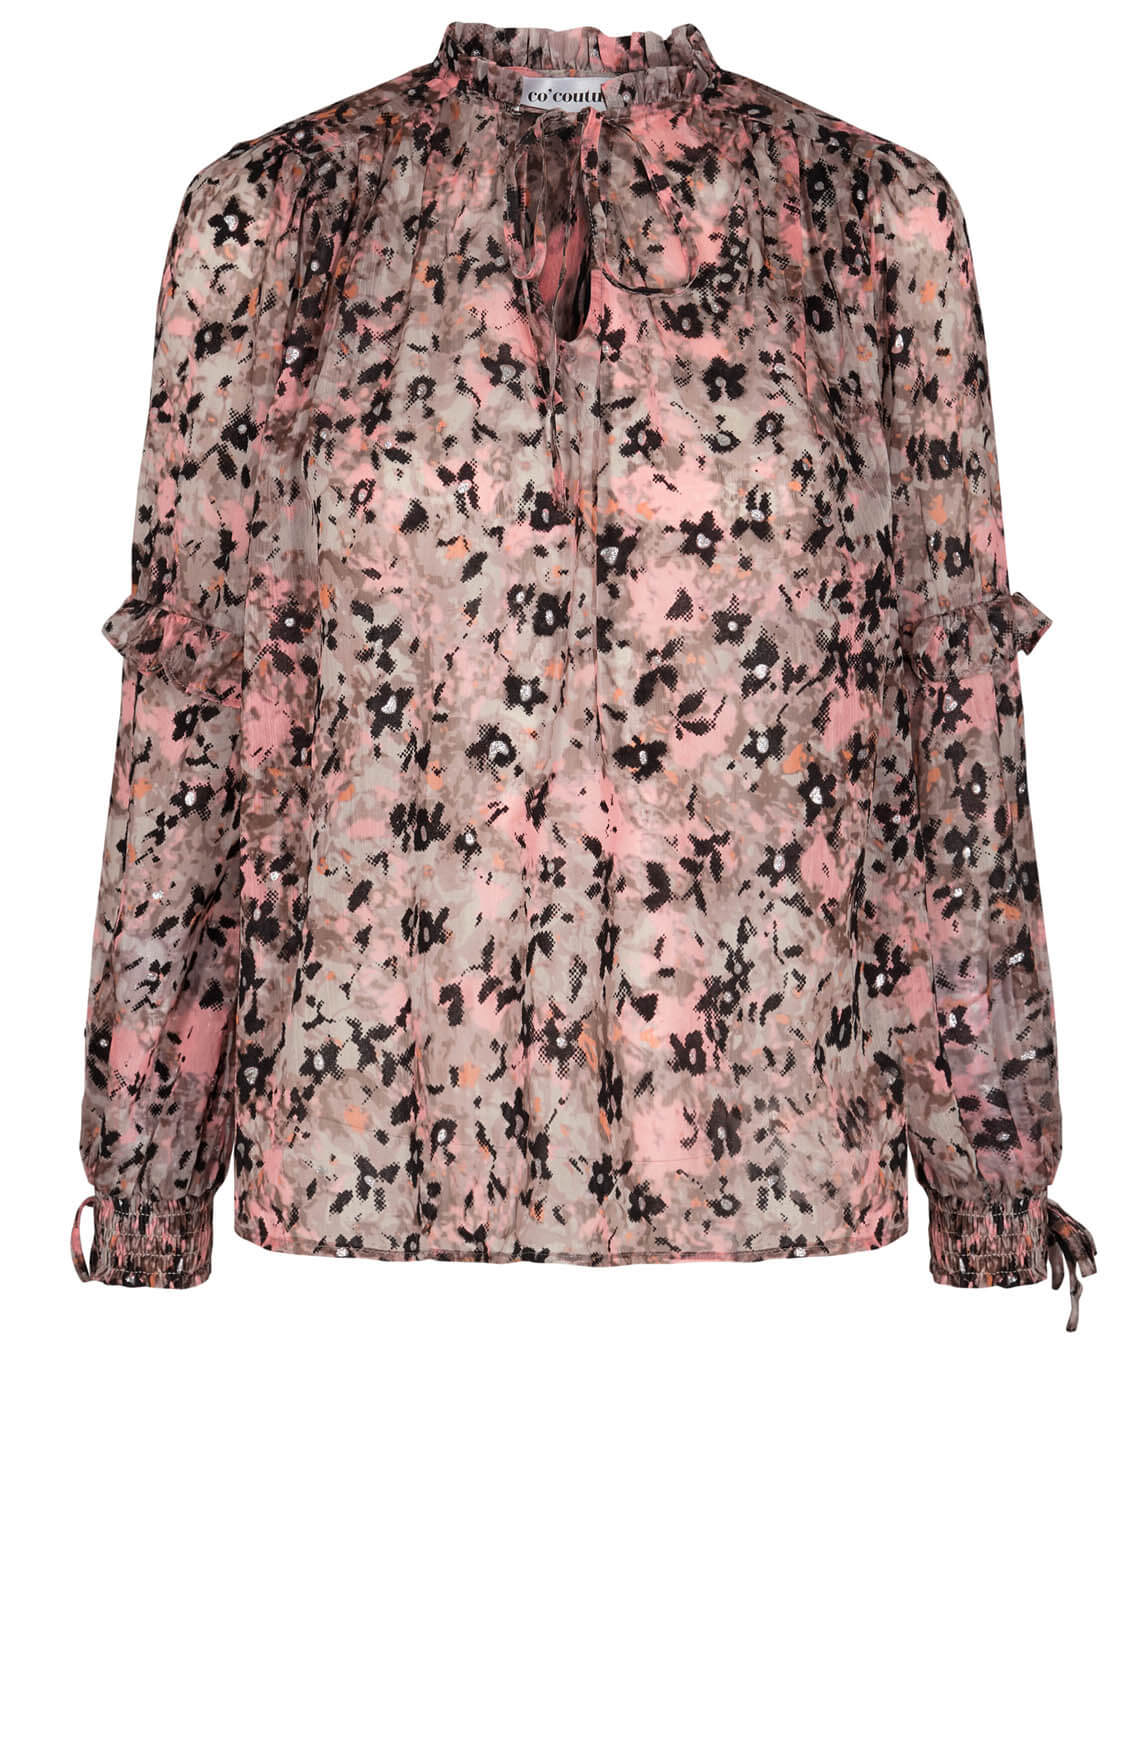 Co Couture Dames Gemma blouse Bruin